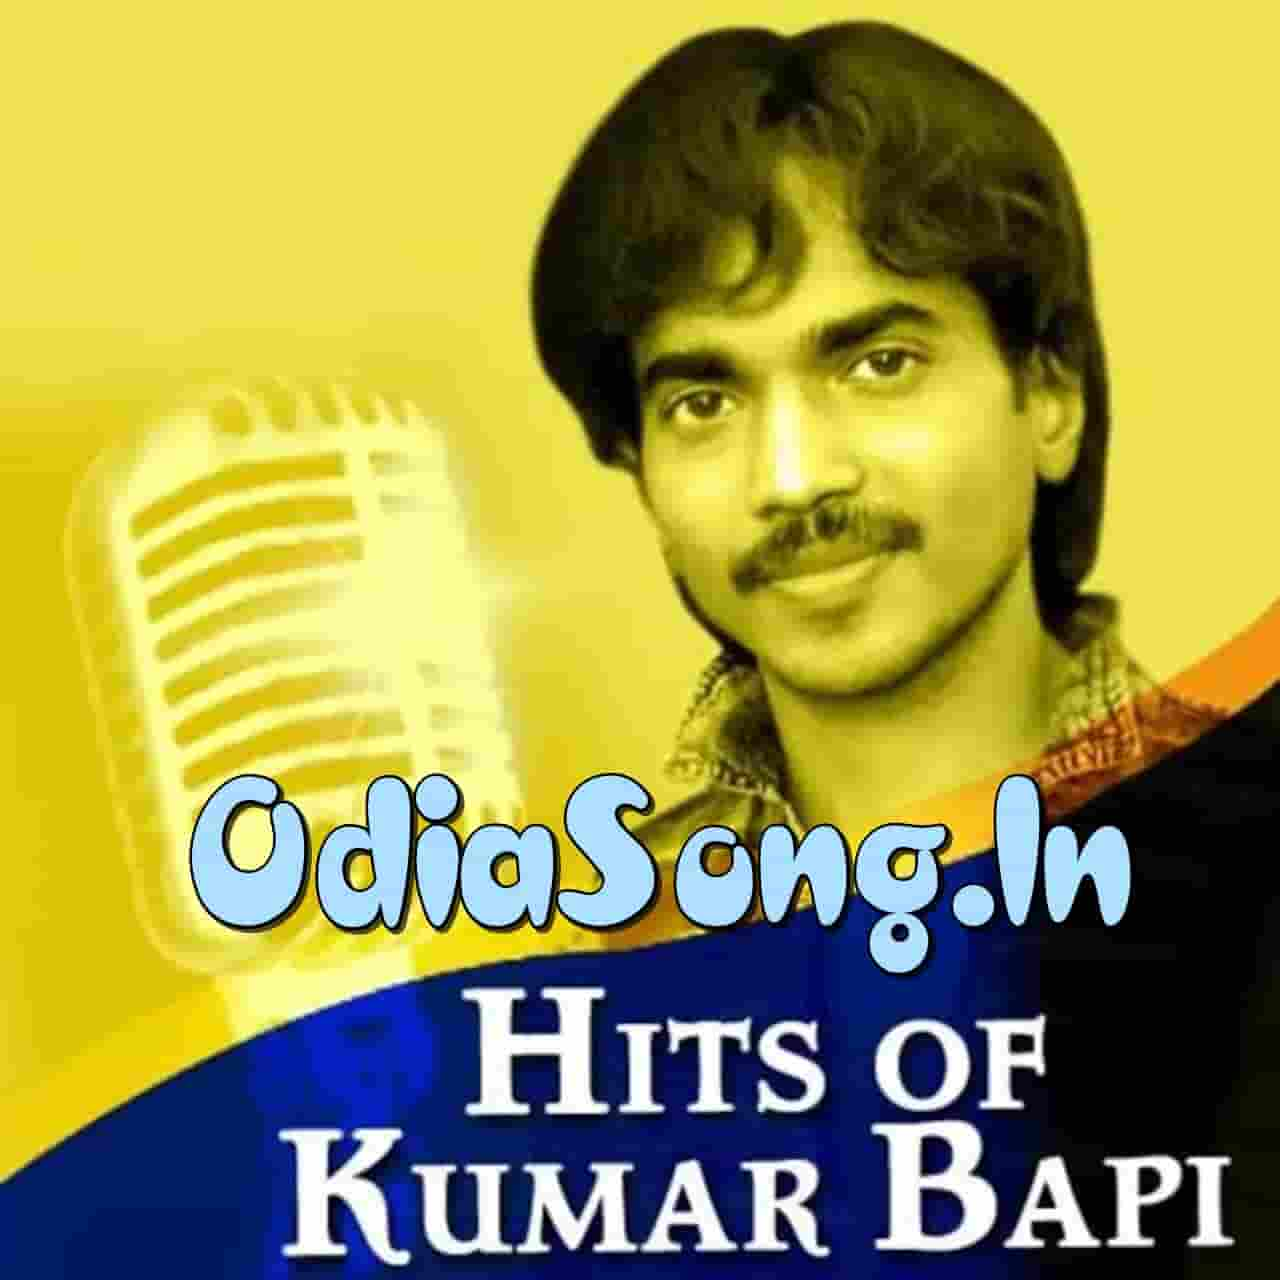 Lo Rubi Heijaa Mo Bibi (Kumar Bapi)